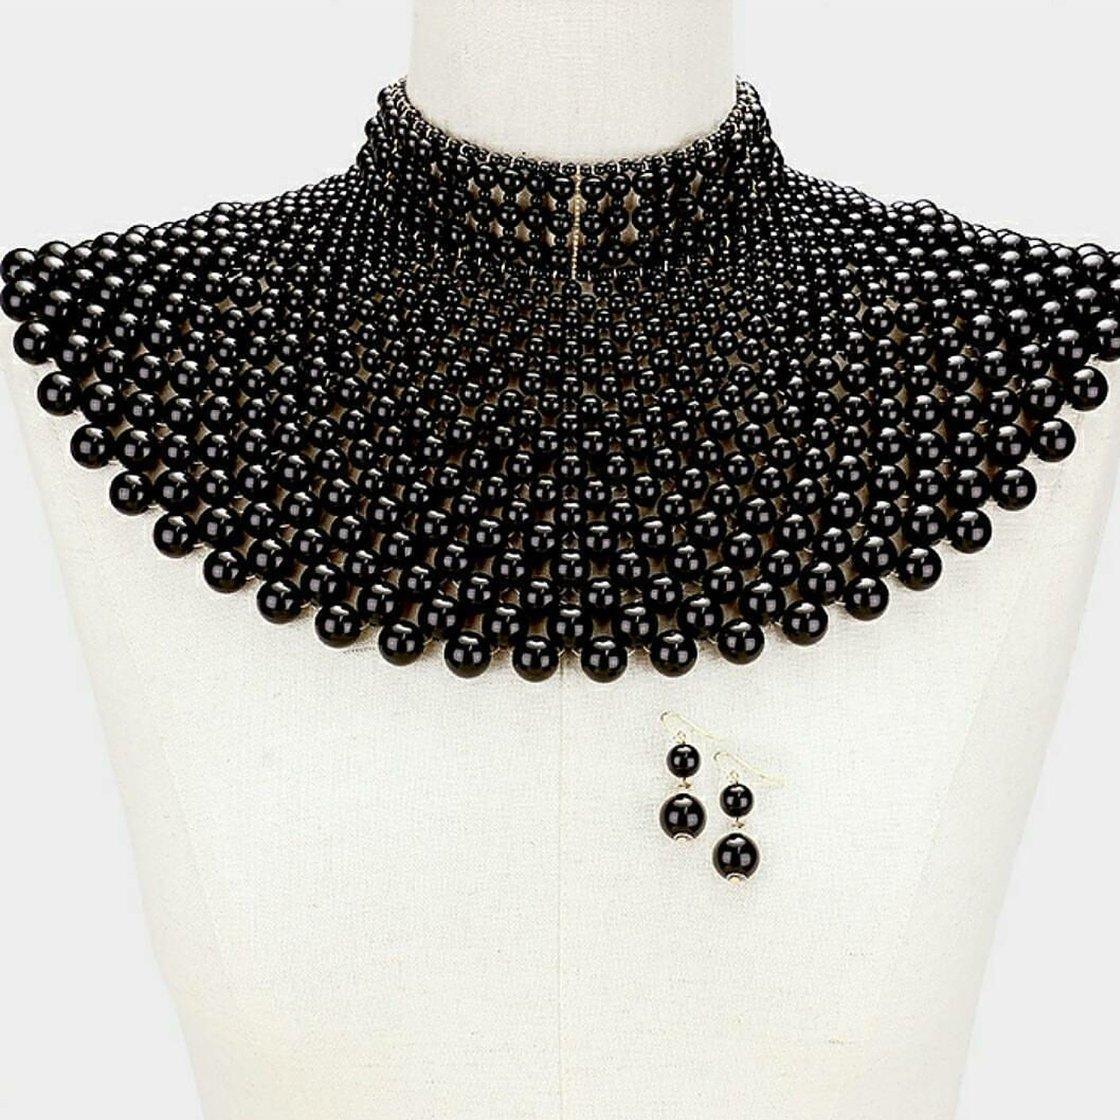 Image of Pearl shoulder necklace